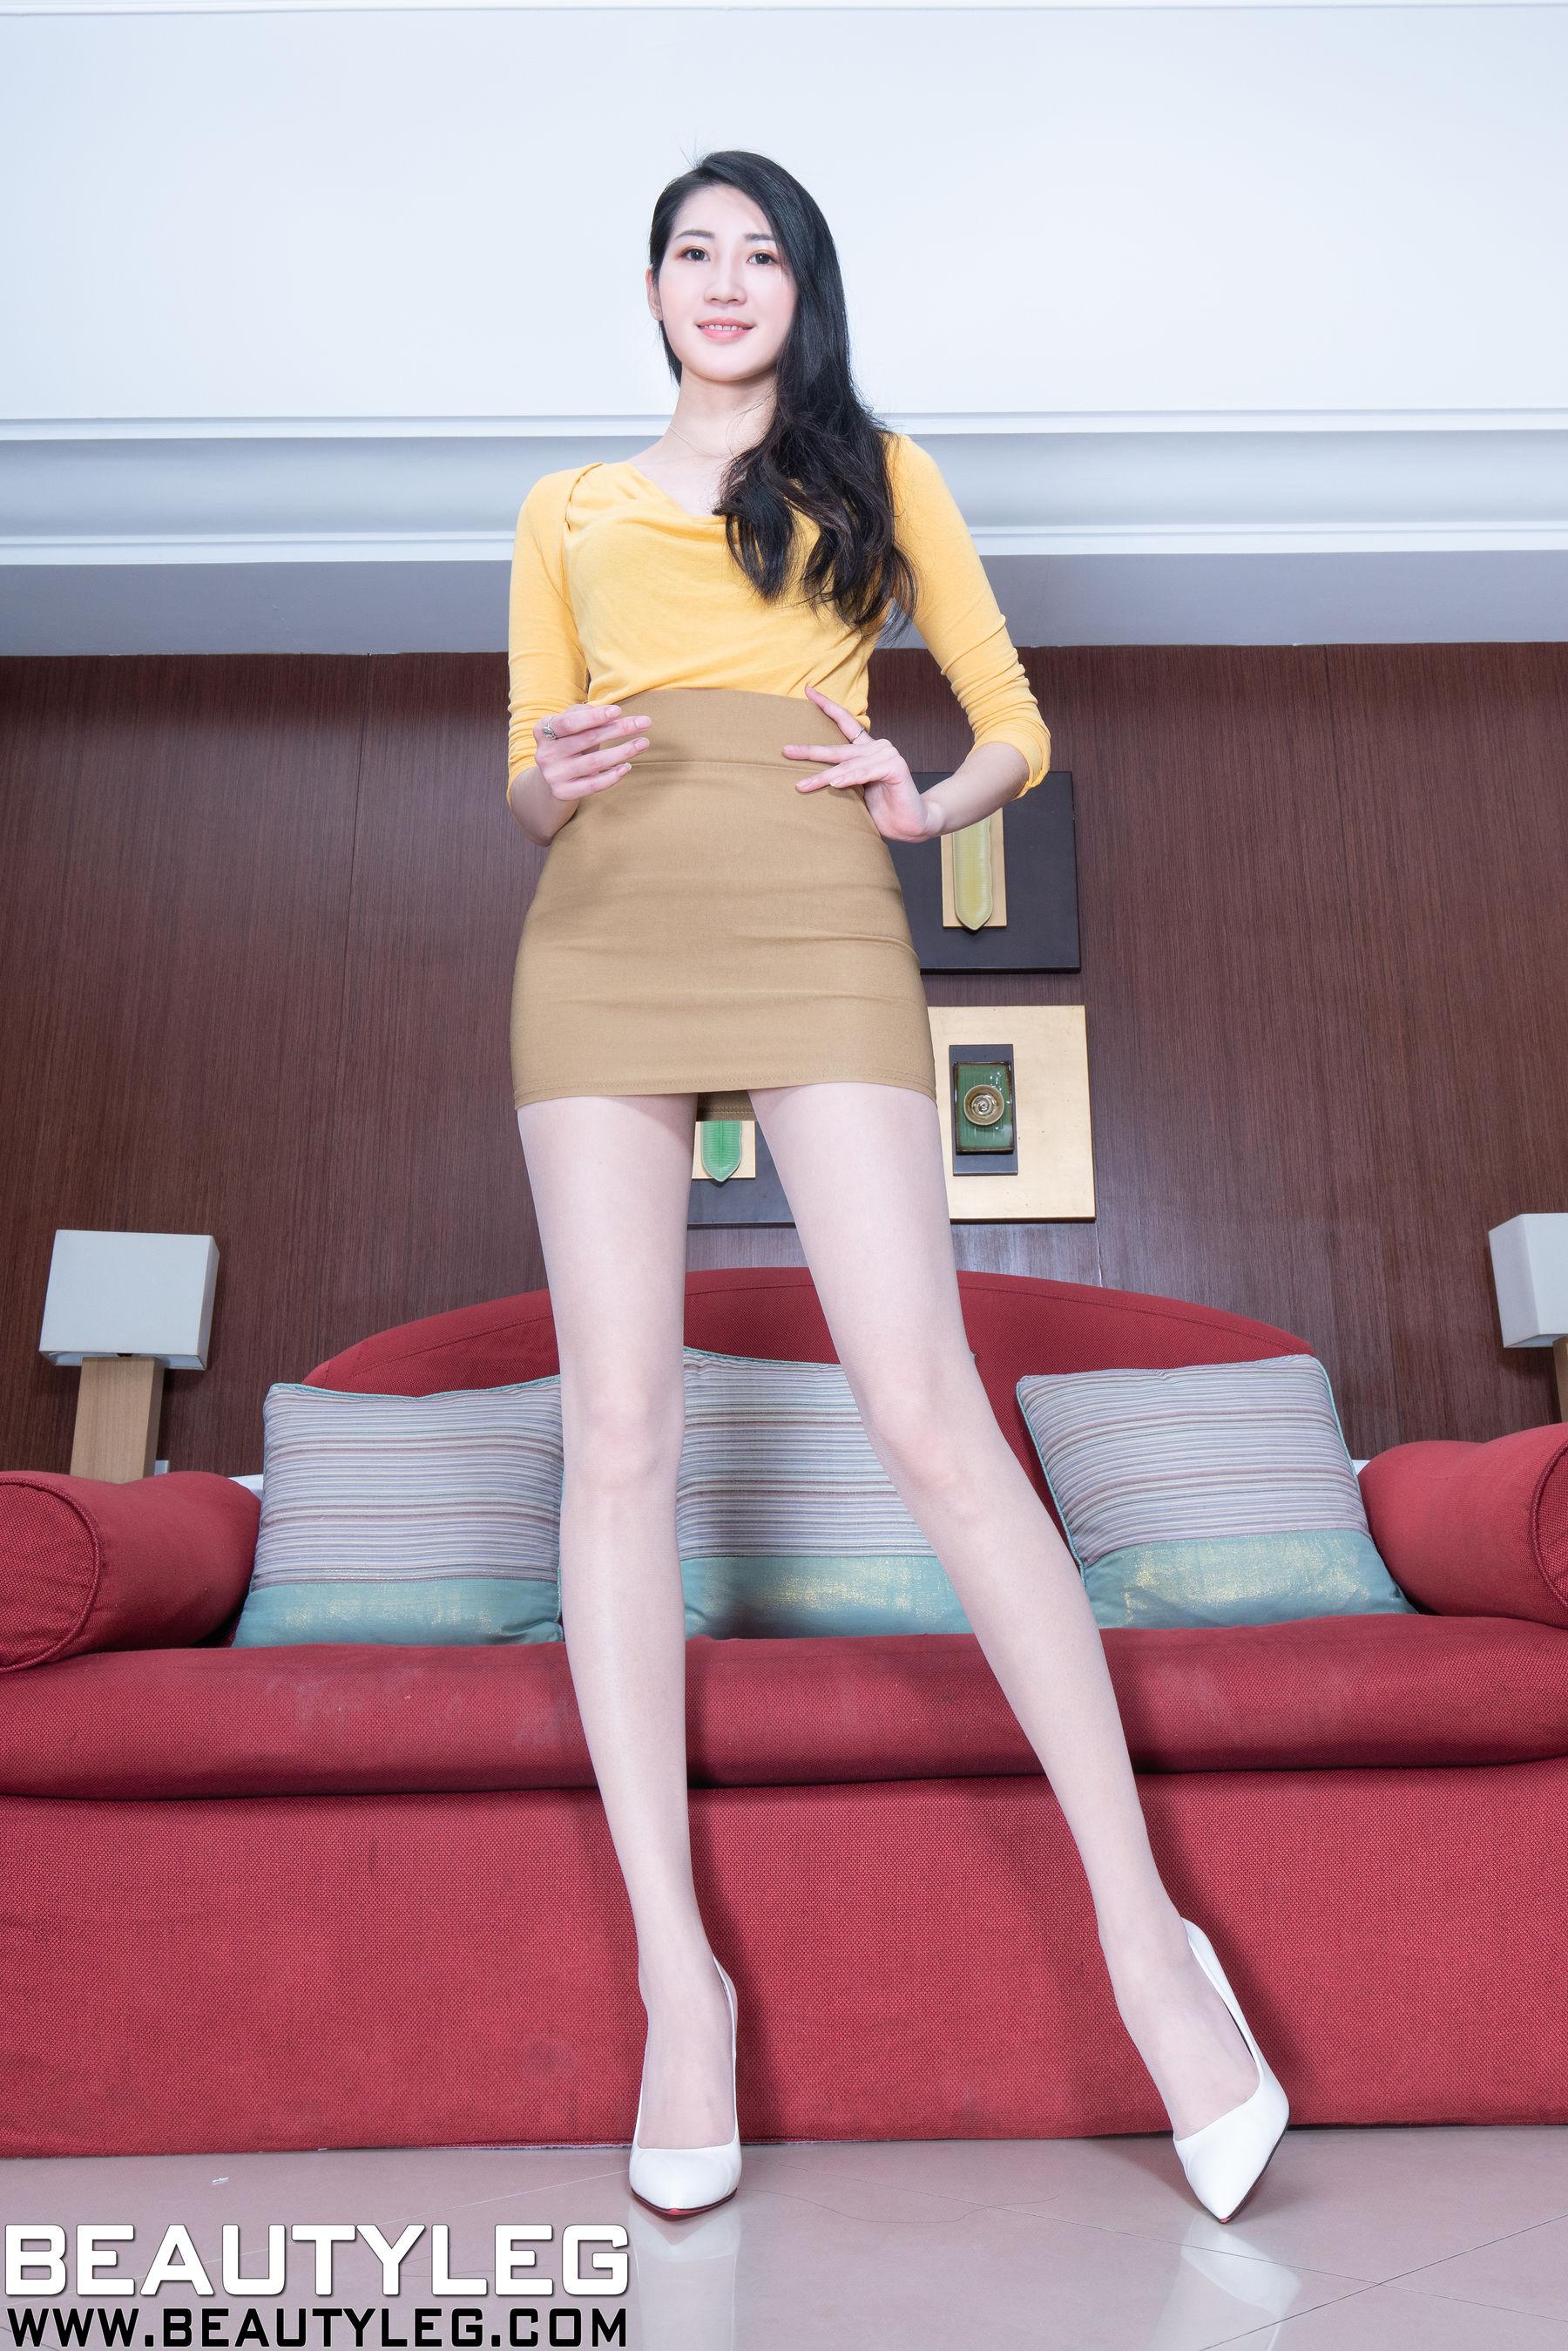 VOL.306 [Beautyleg]高跟长腿美女:腿模Perri超高清个人性感漂亮大图(46P)